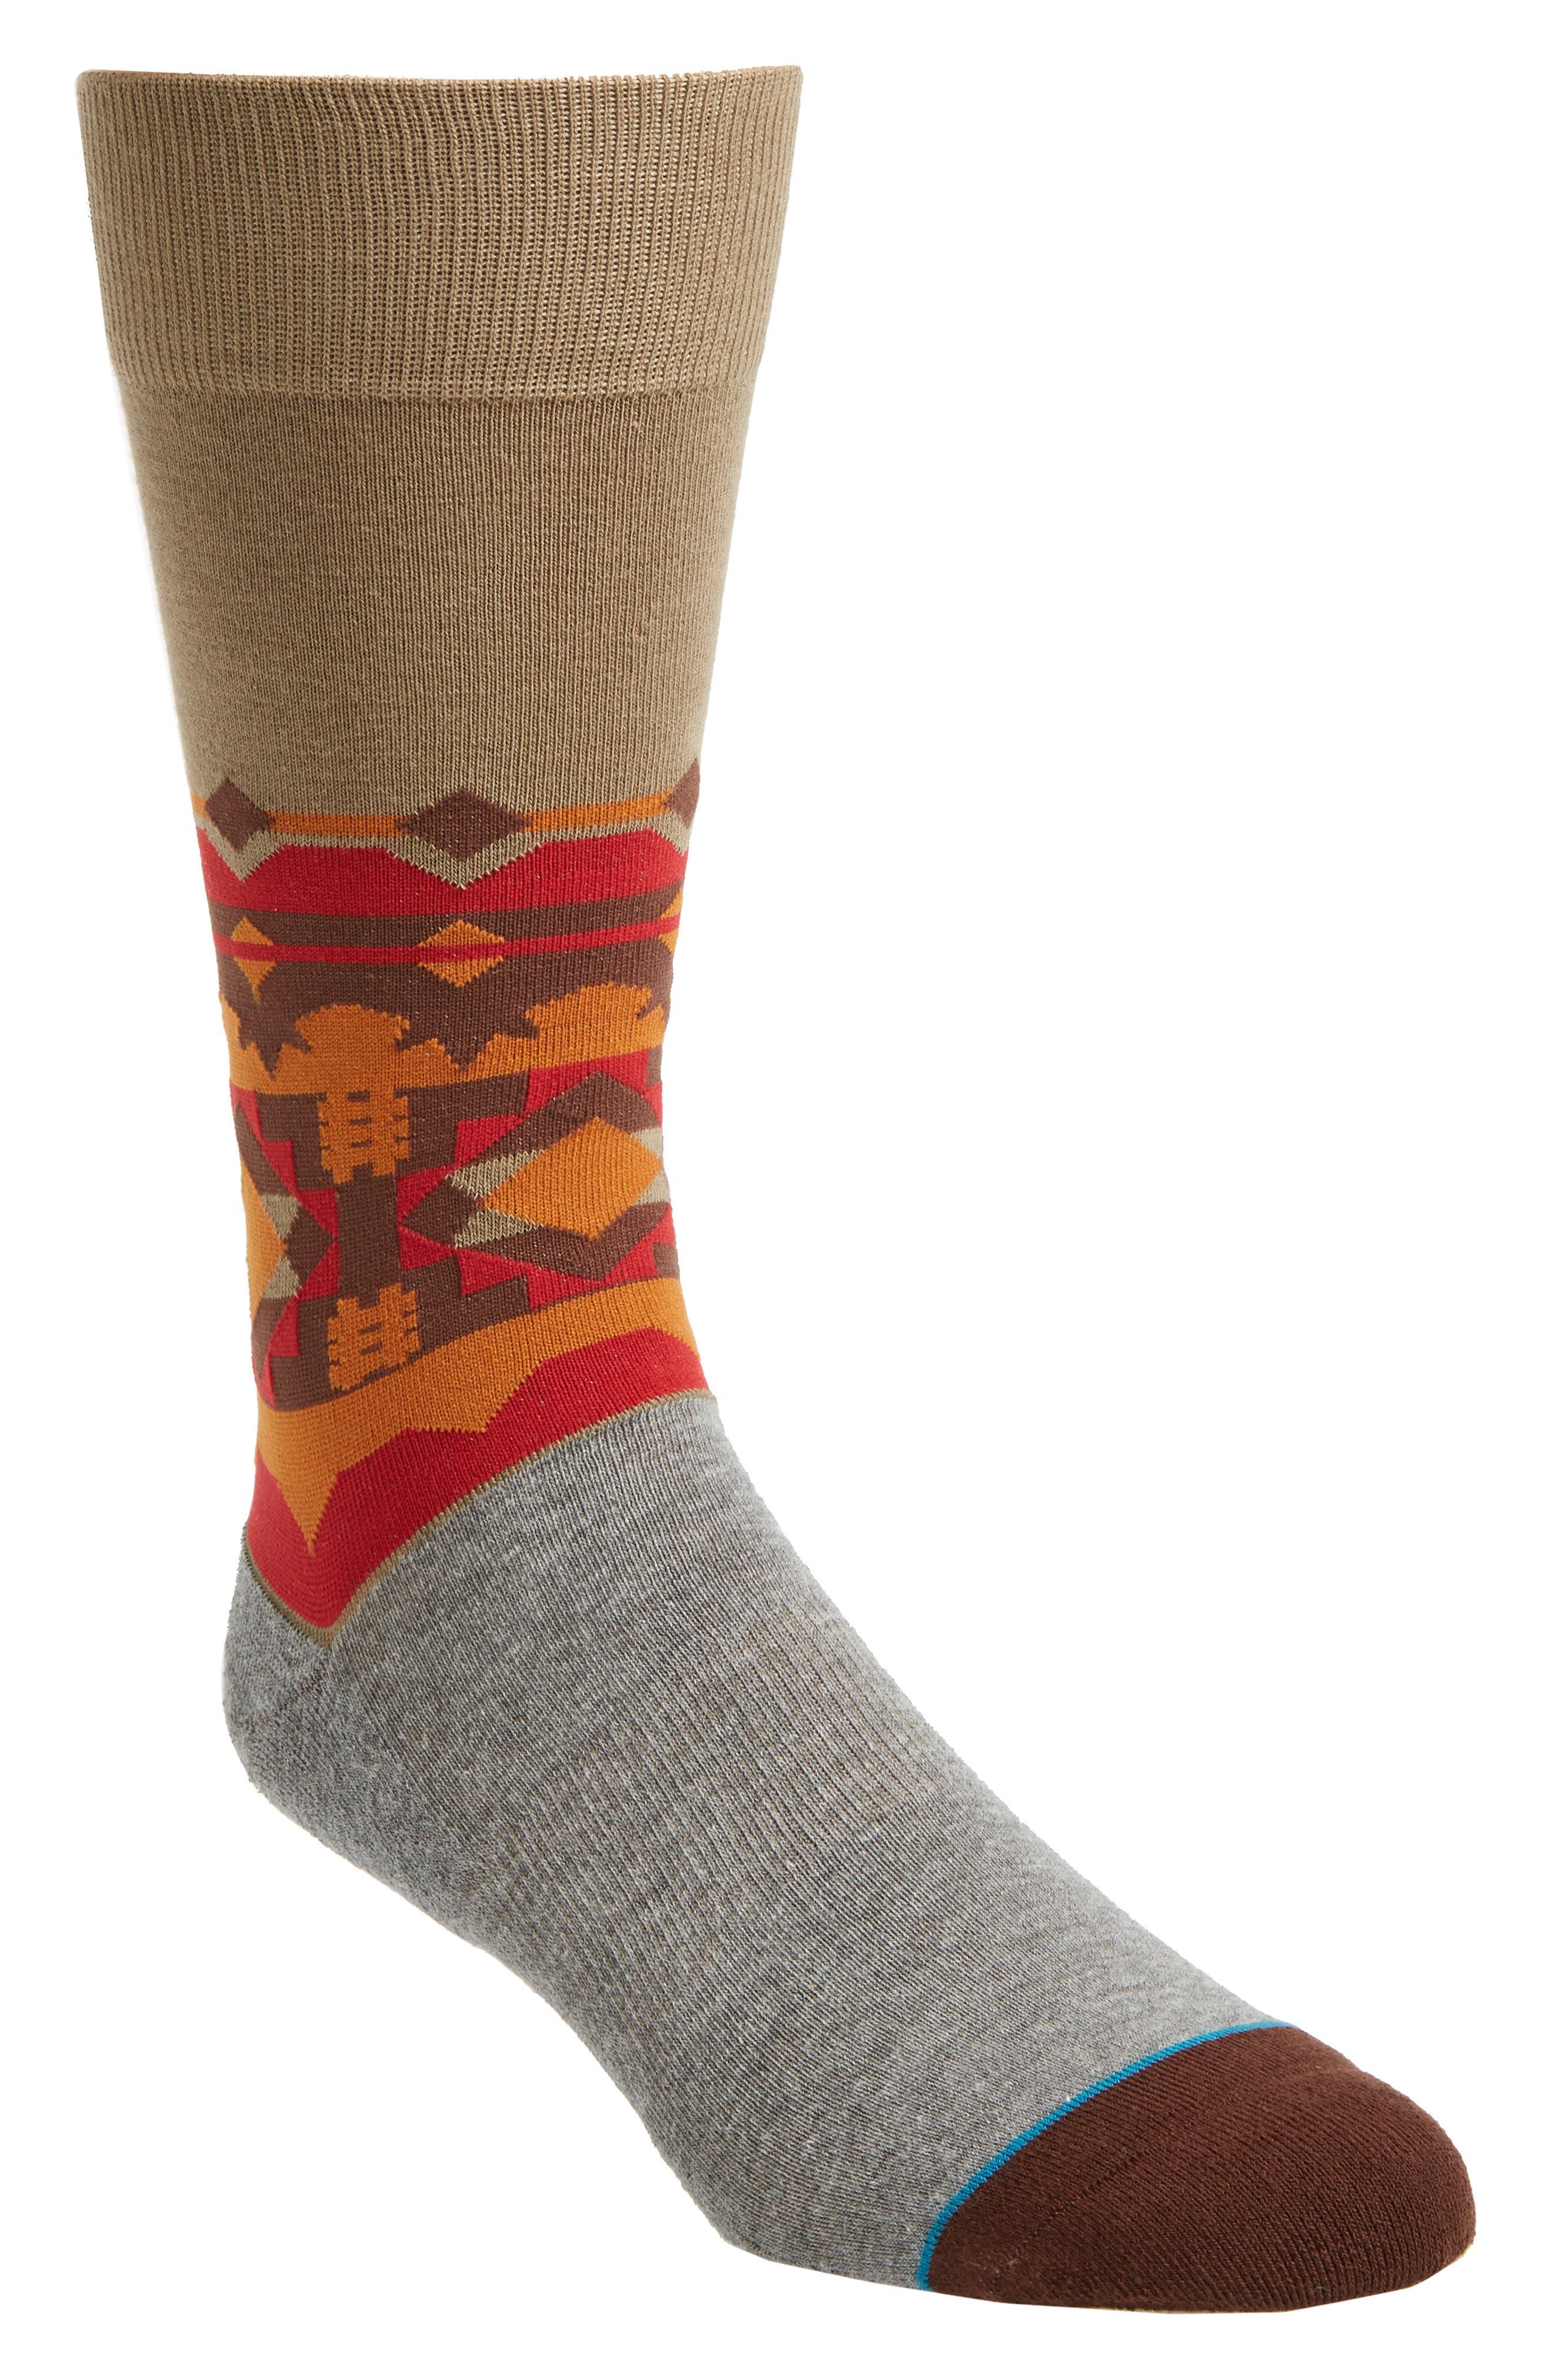 Sinaloa Socks,                         Main,                         color, Red/ Olive